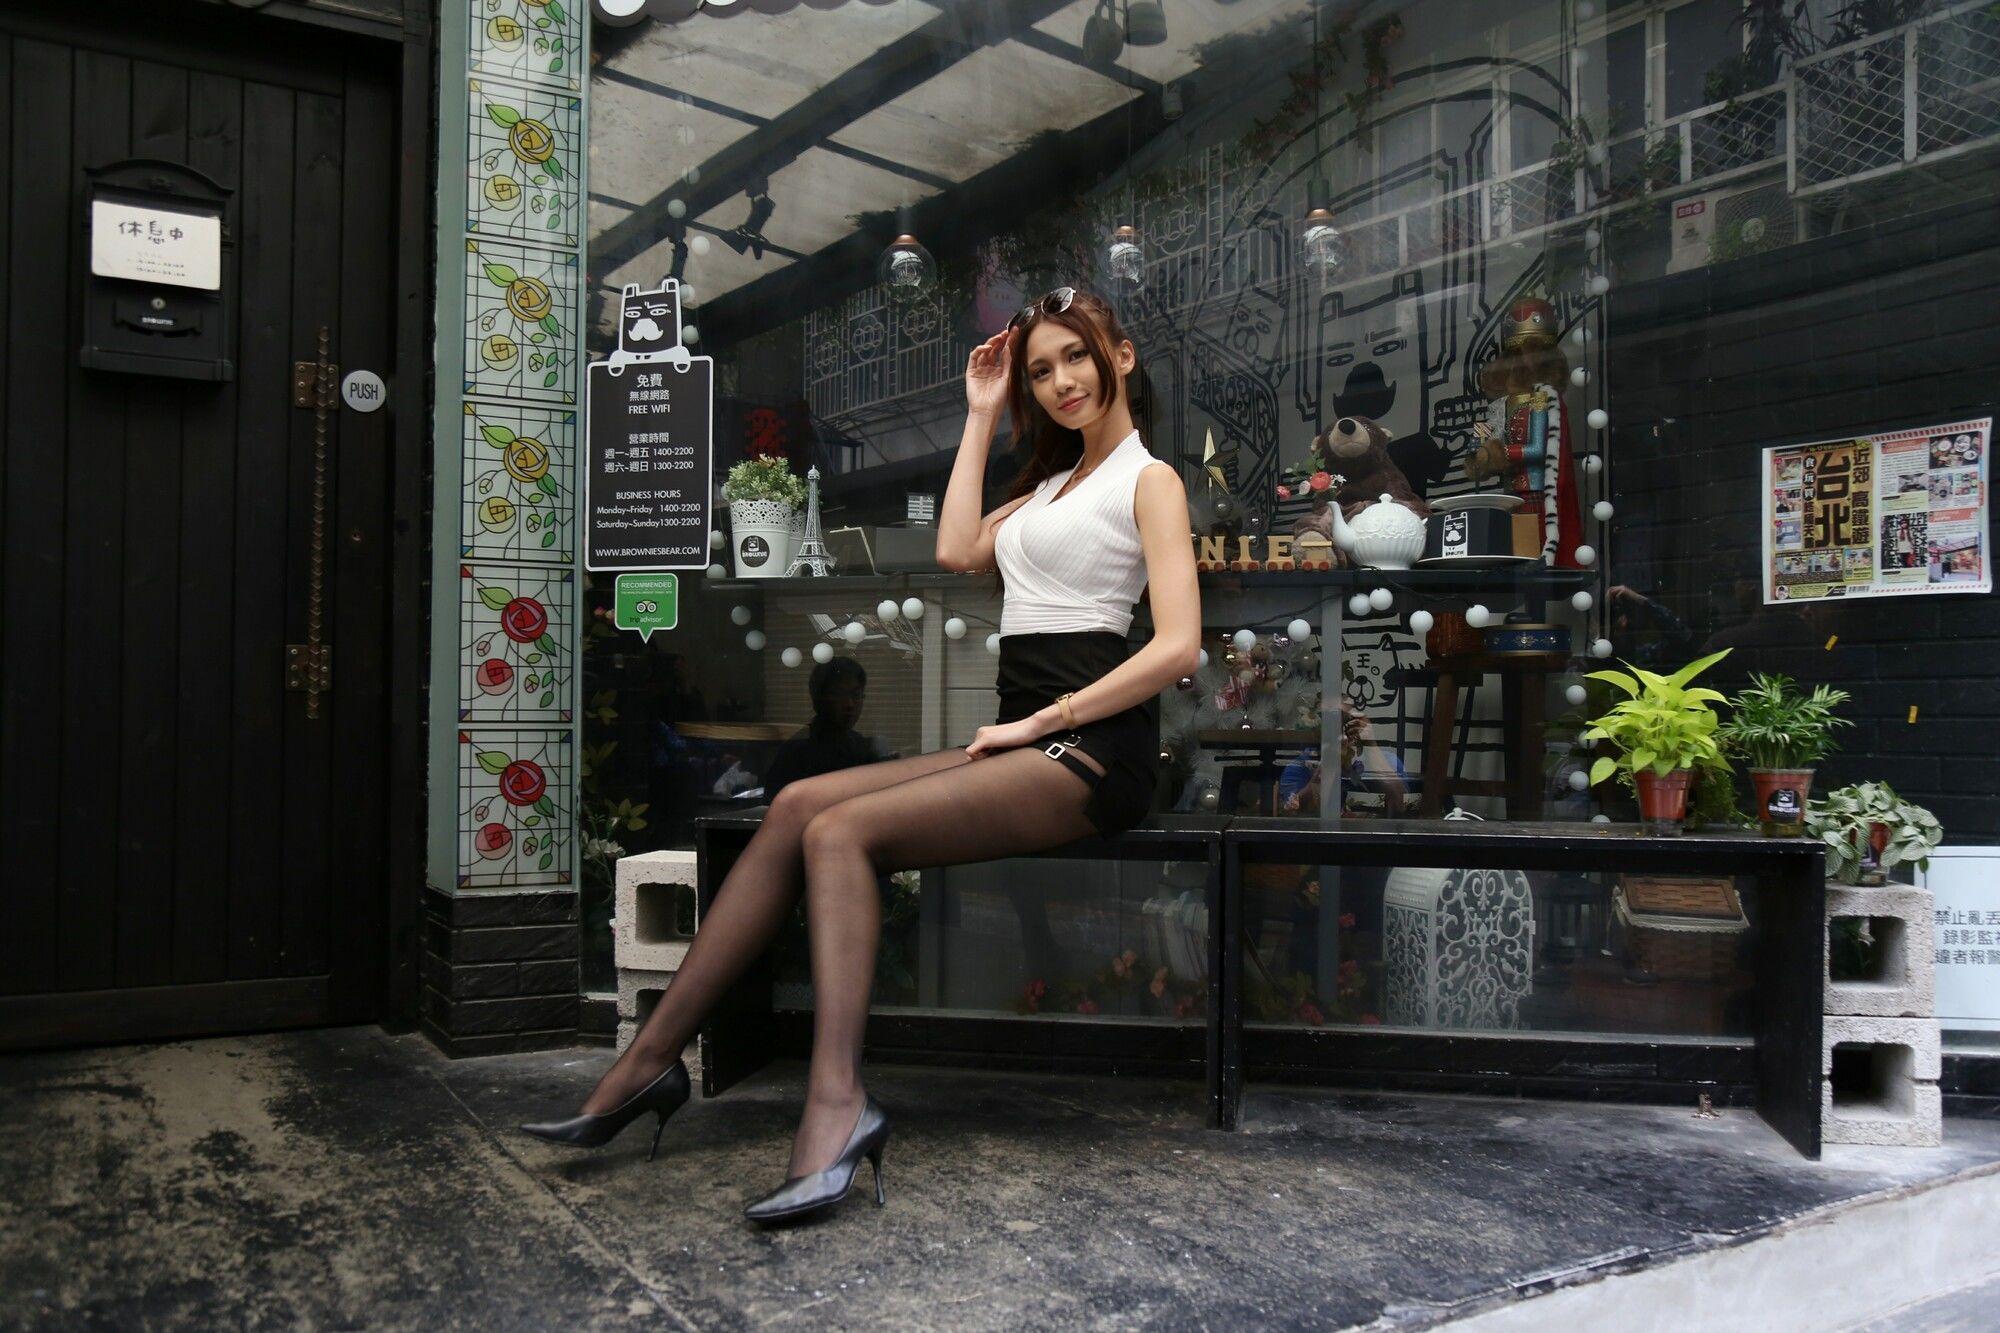 VOL.1098 [台湾正妹]丝袜美腿黑丝包臀裙美女街拍黑丝:蔡译心(Candice)超高清个人性感漂亮大图(112P)